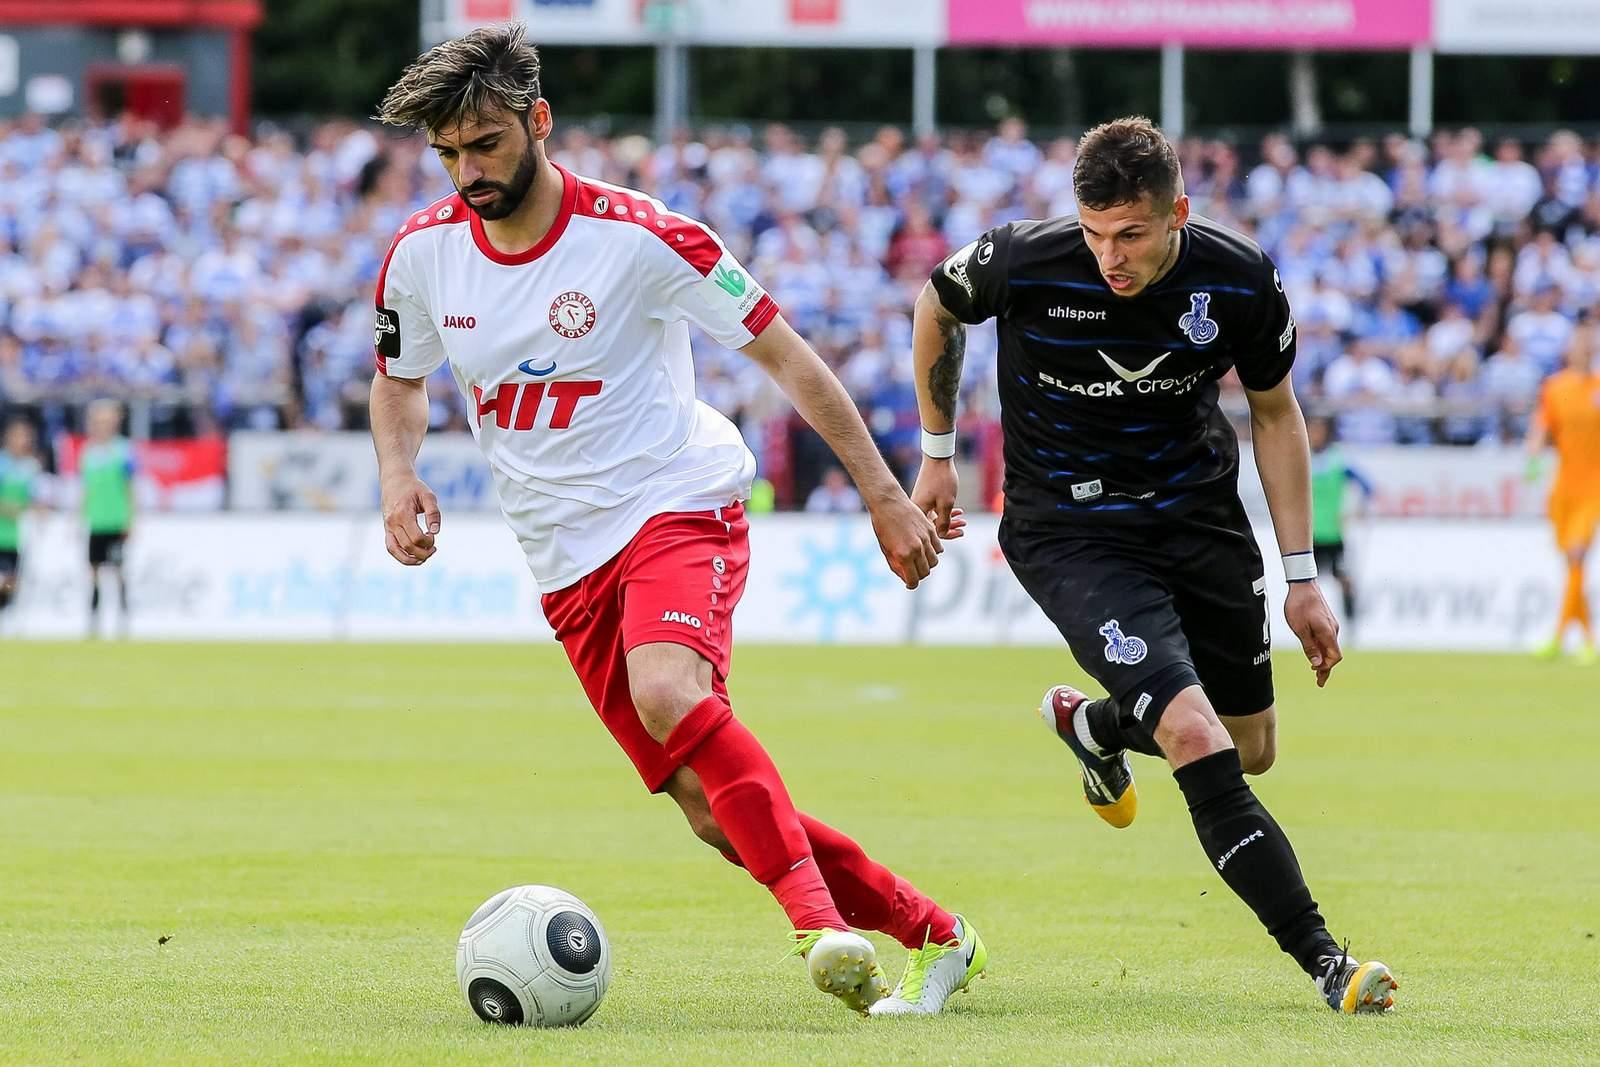 Selcuk Alibaz von Fortuna Köln